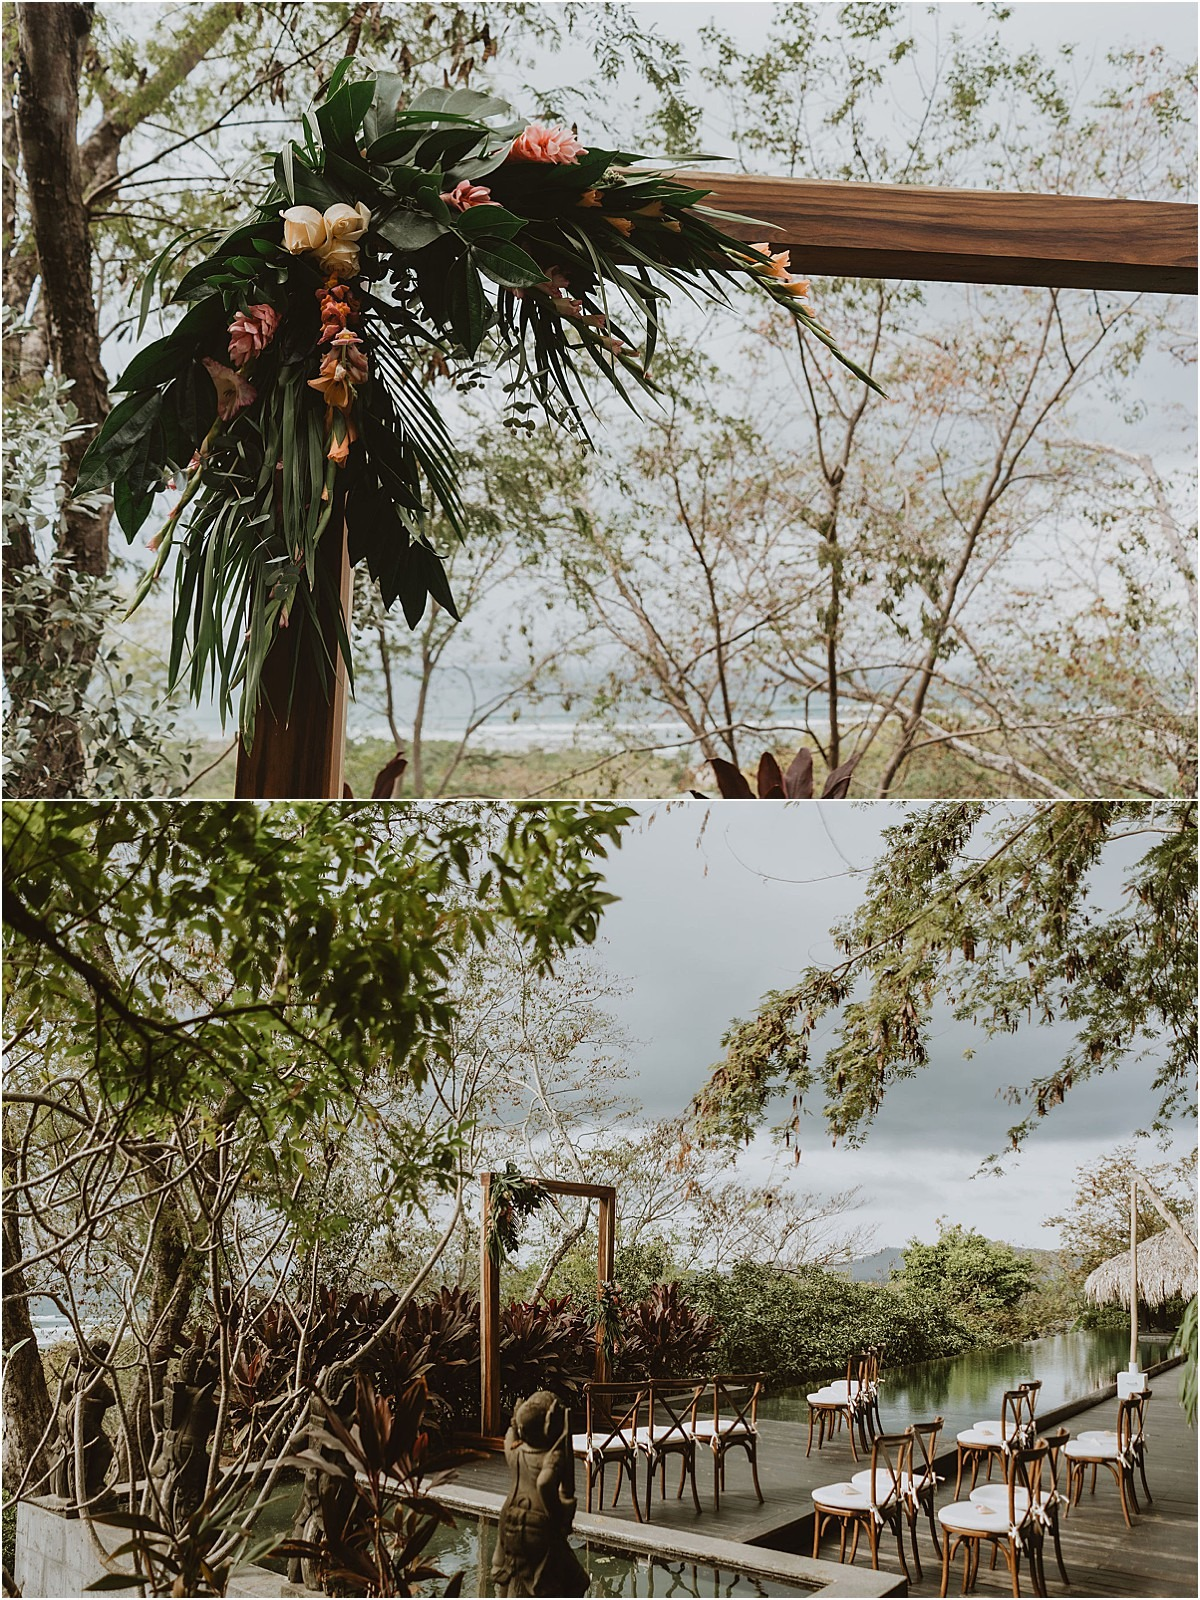 guanacaste florist in costa rica